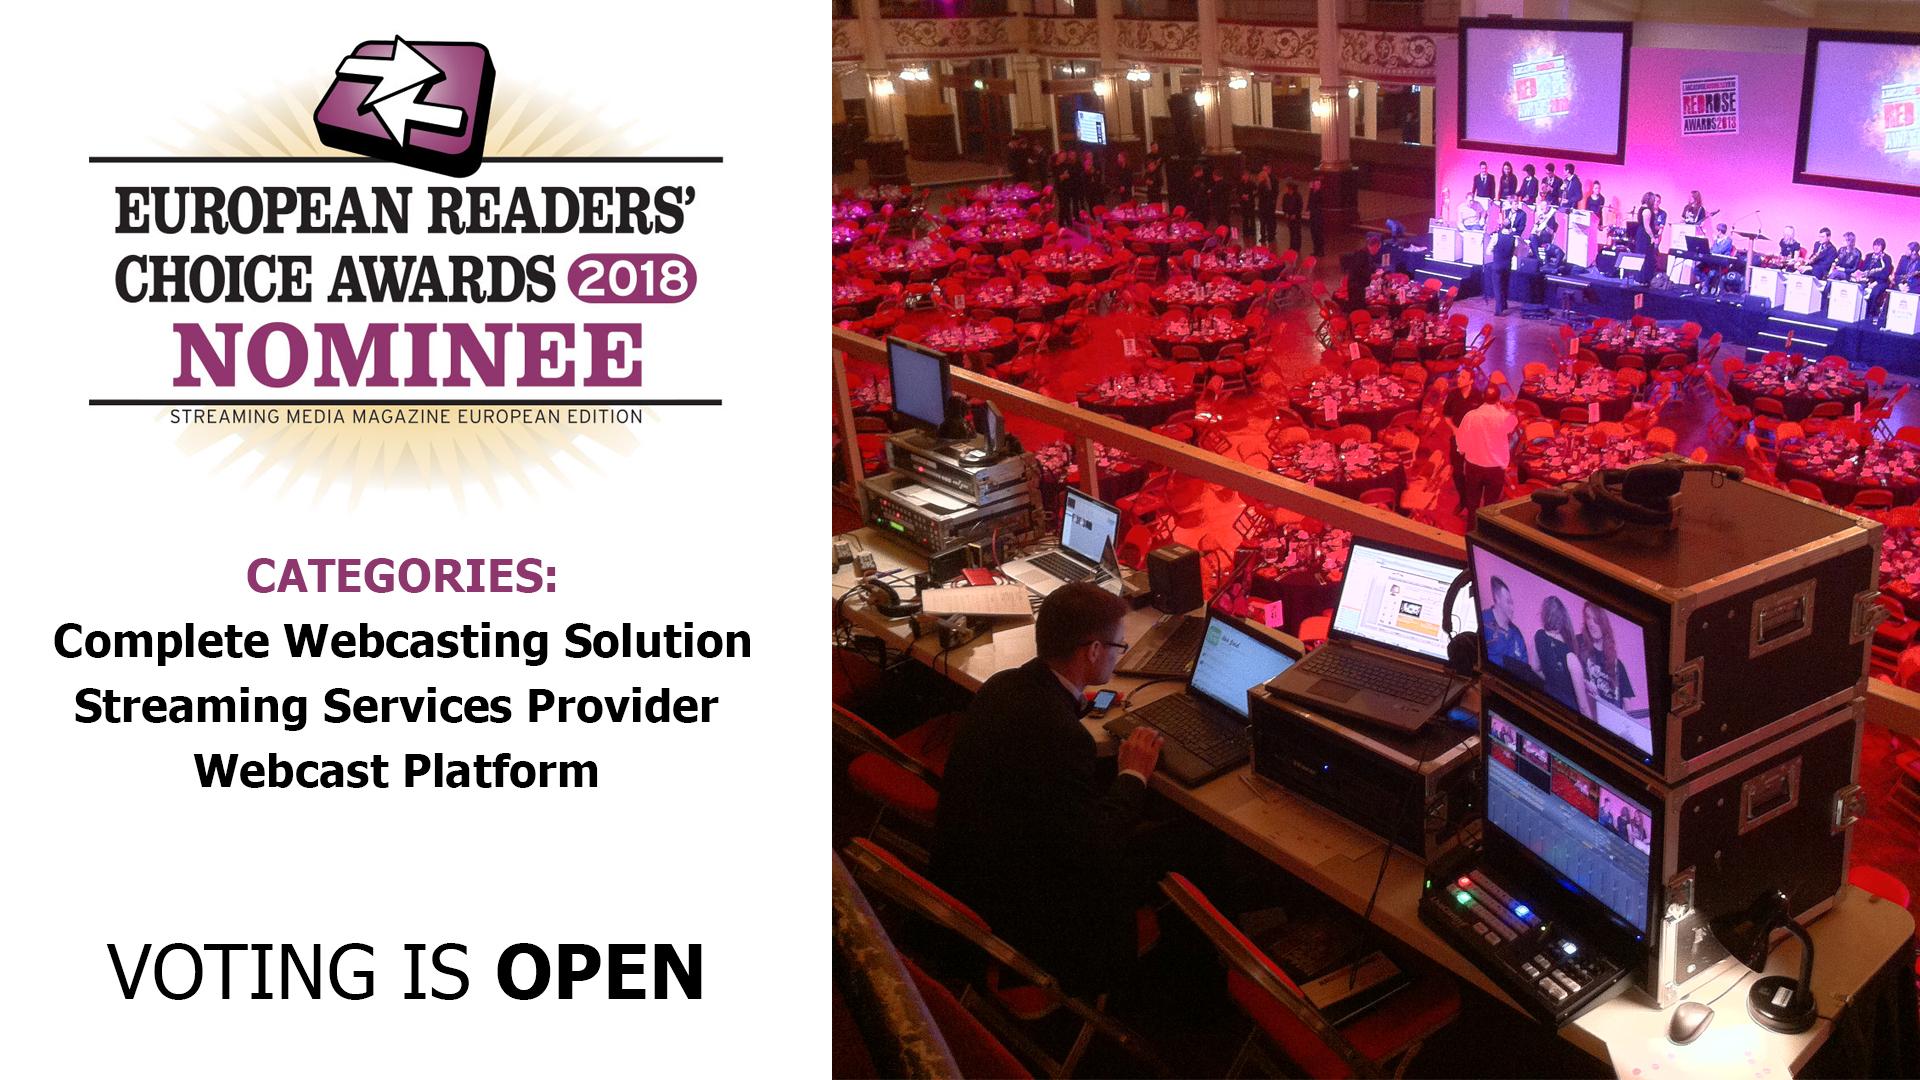 streaming awards winner wavefx live streaming company webcasting production uk stream